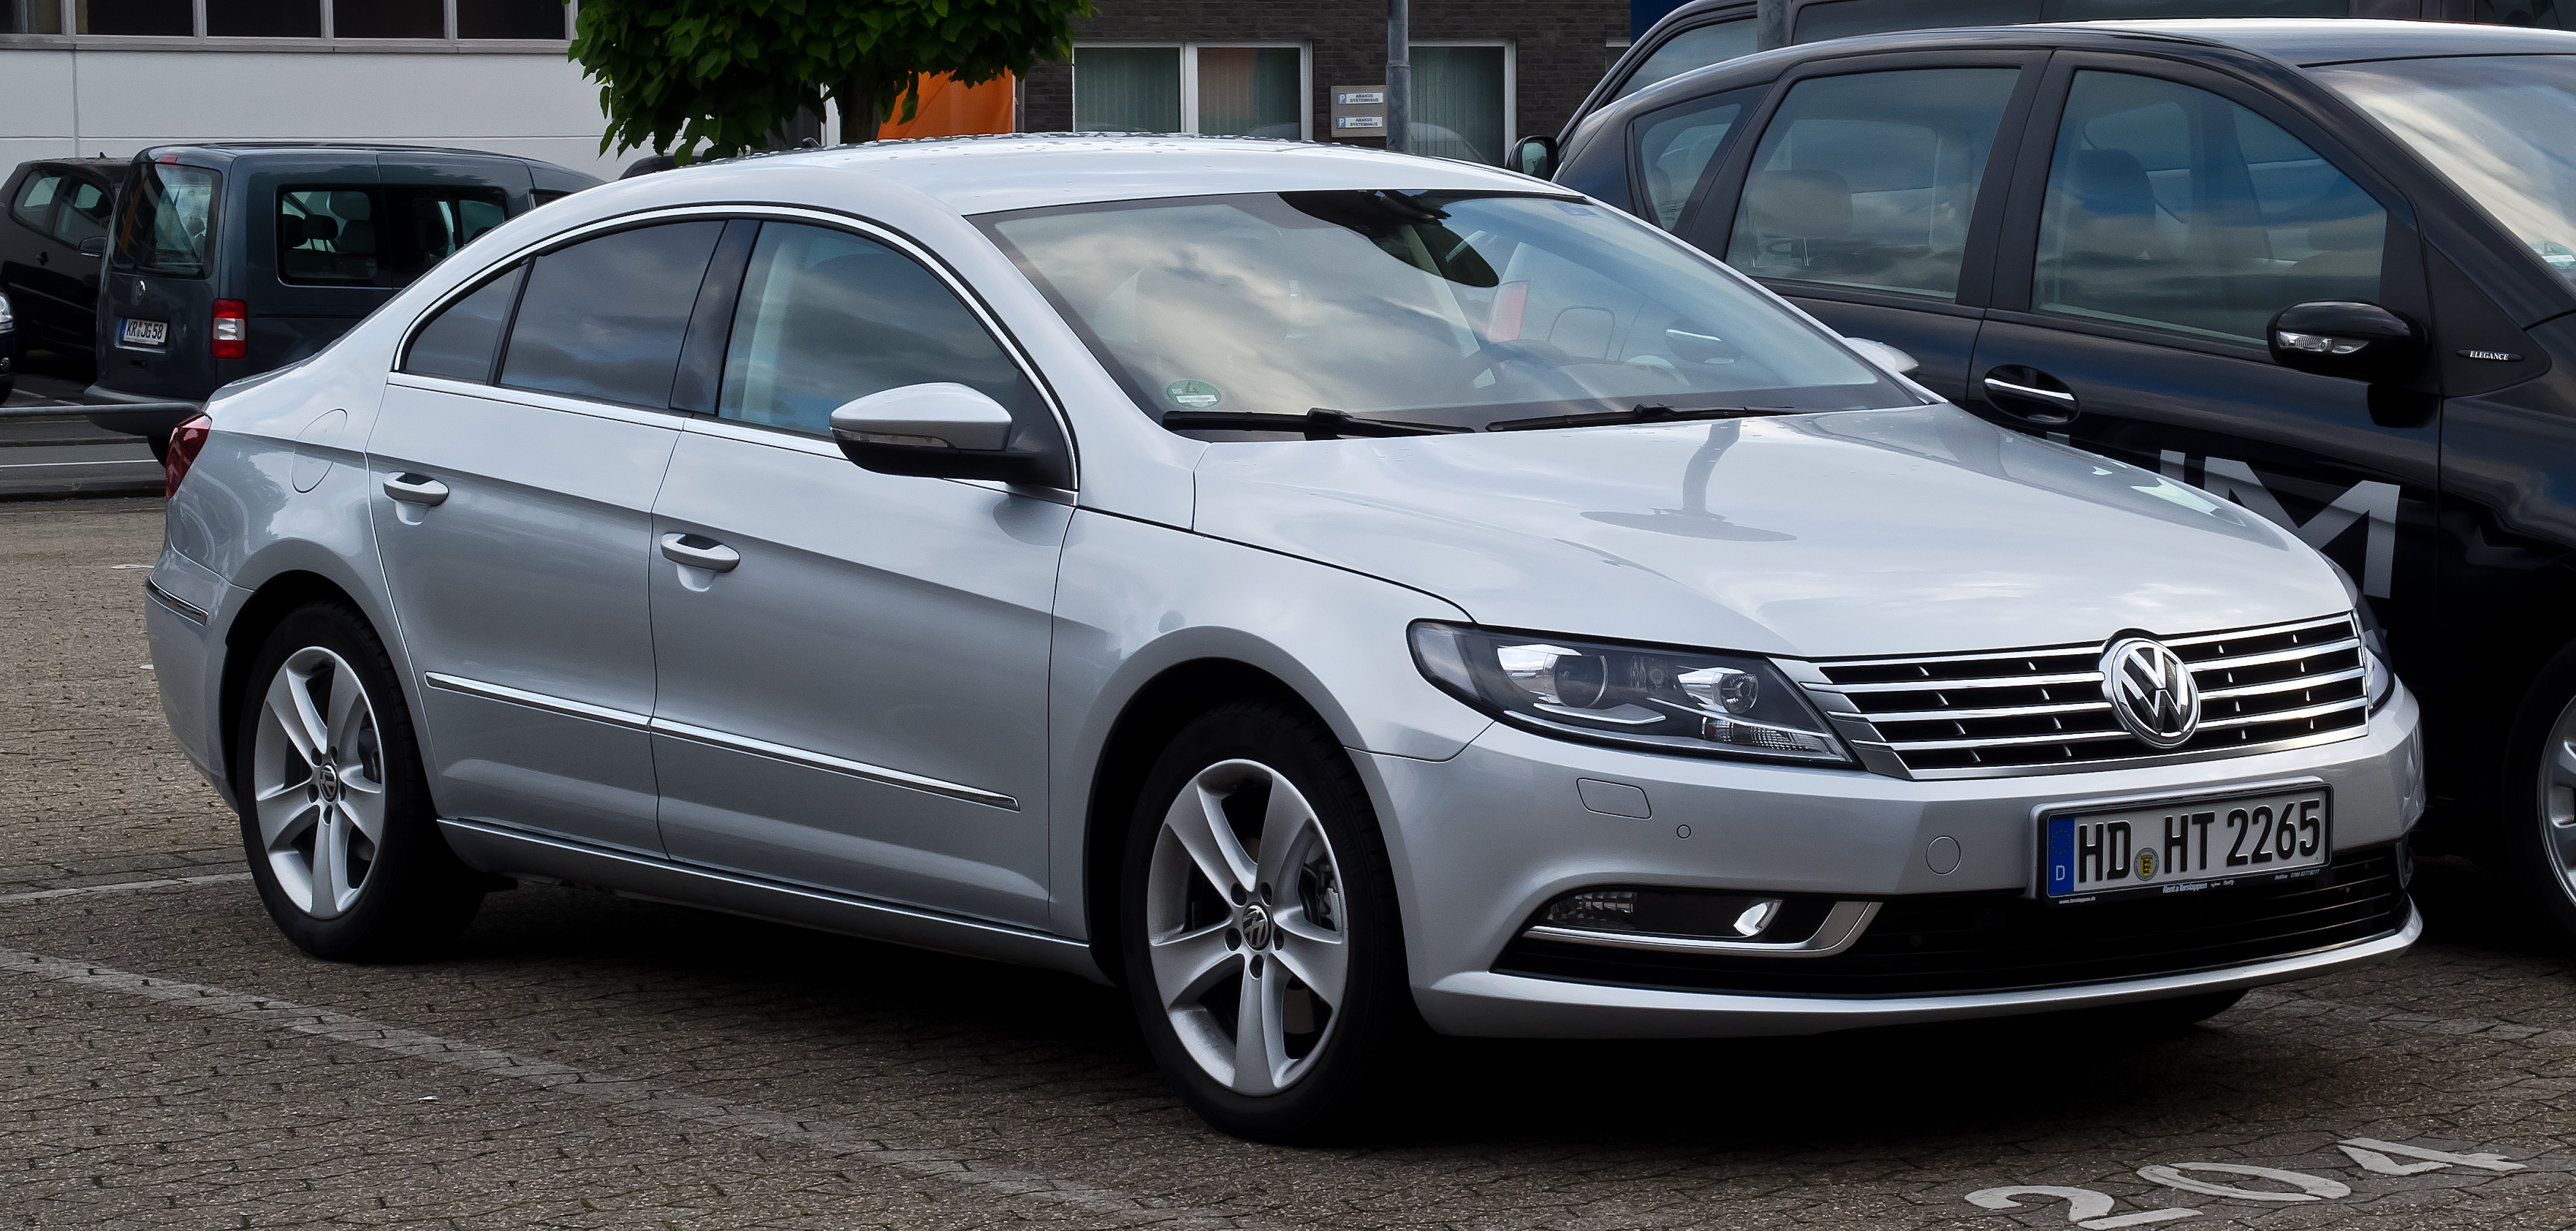 File:Volkswagen CC 2.0 TDI BlueMotion Technology (Facelift ...